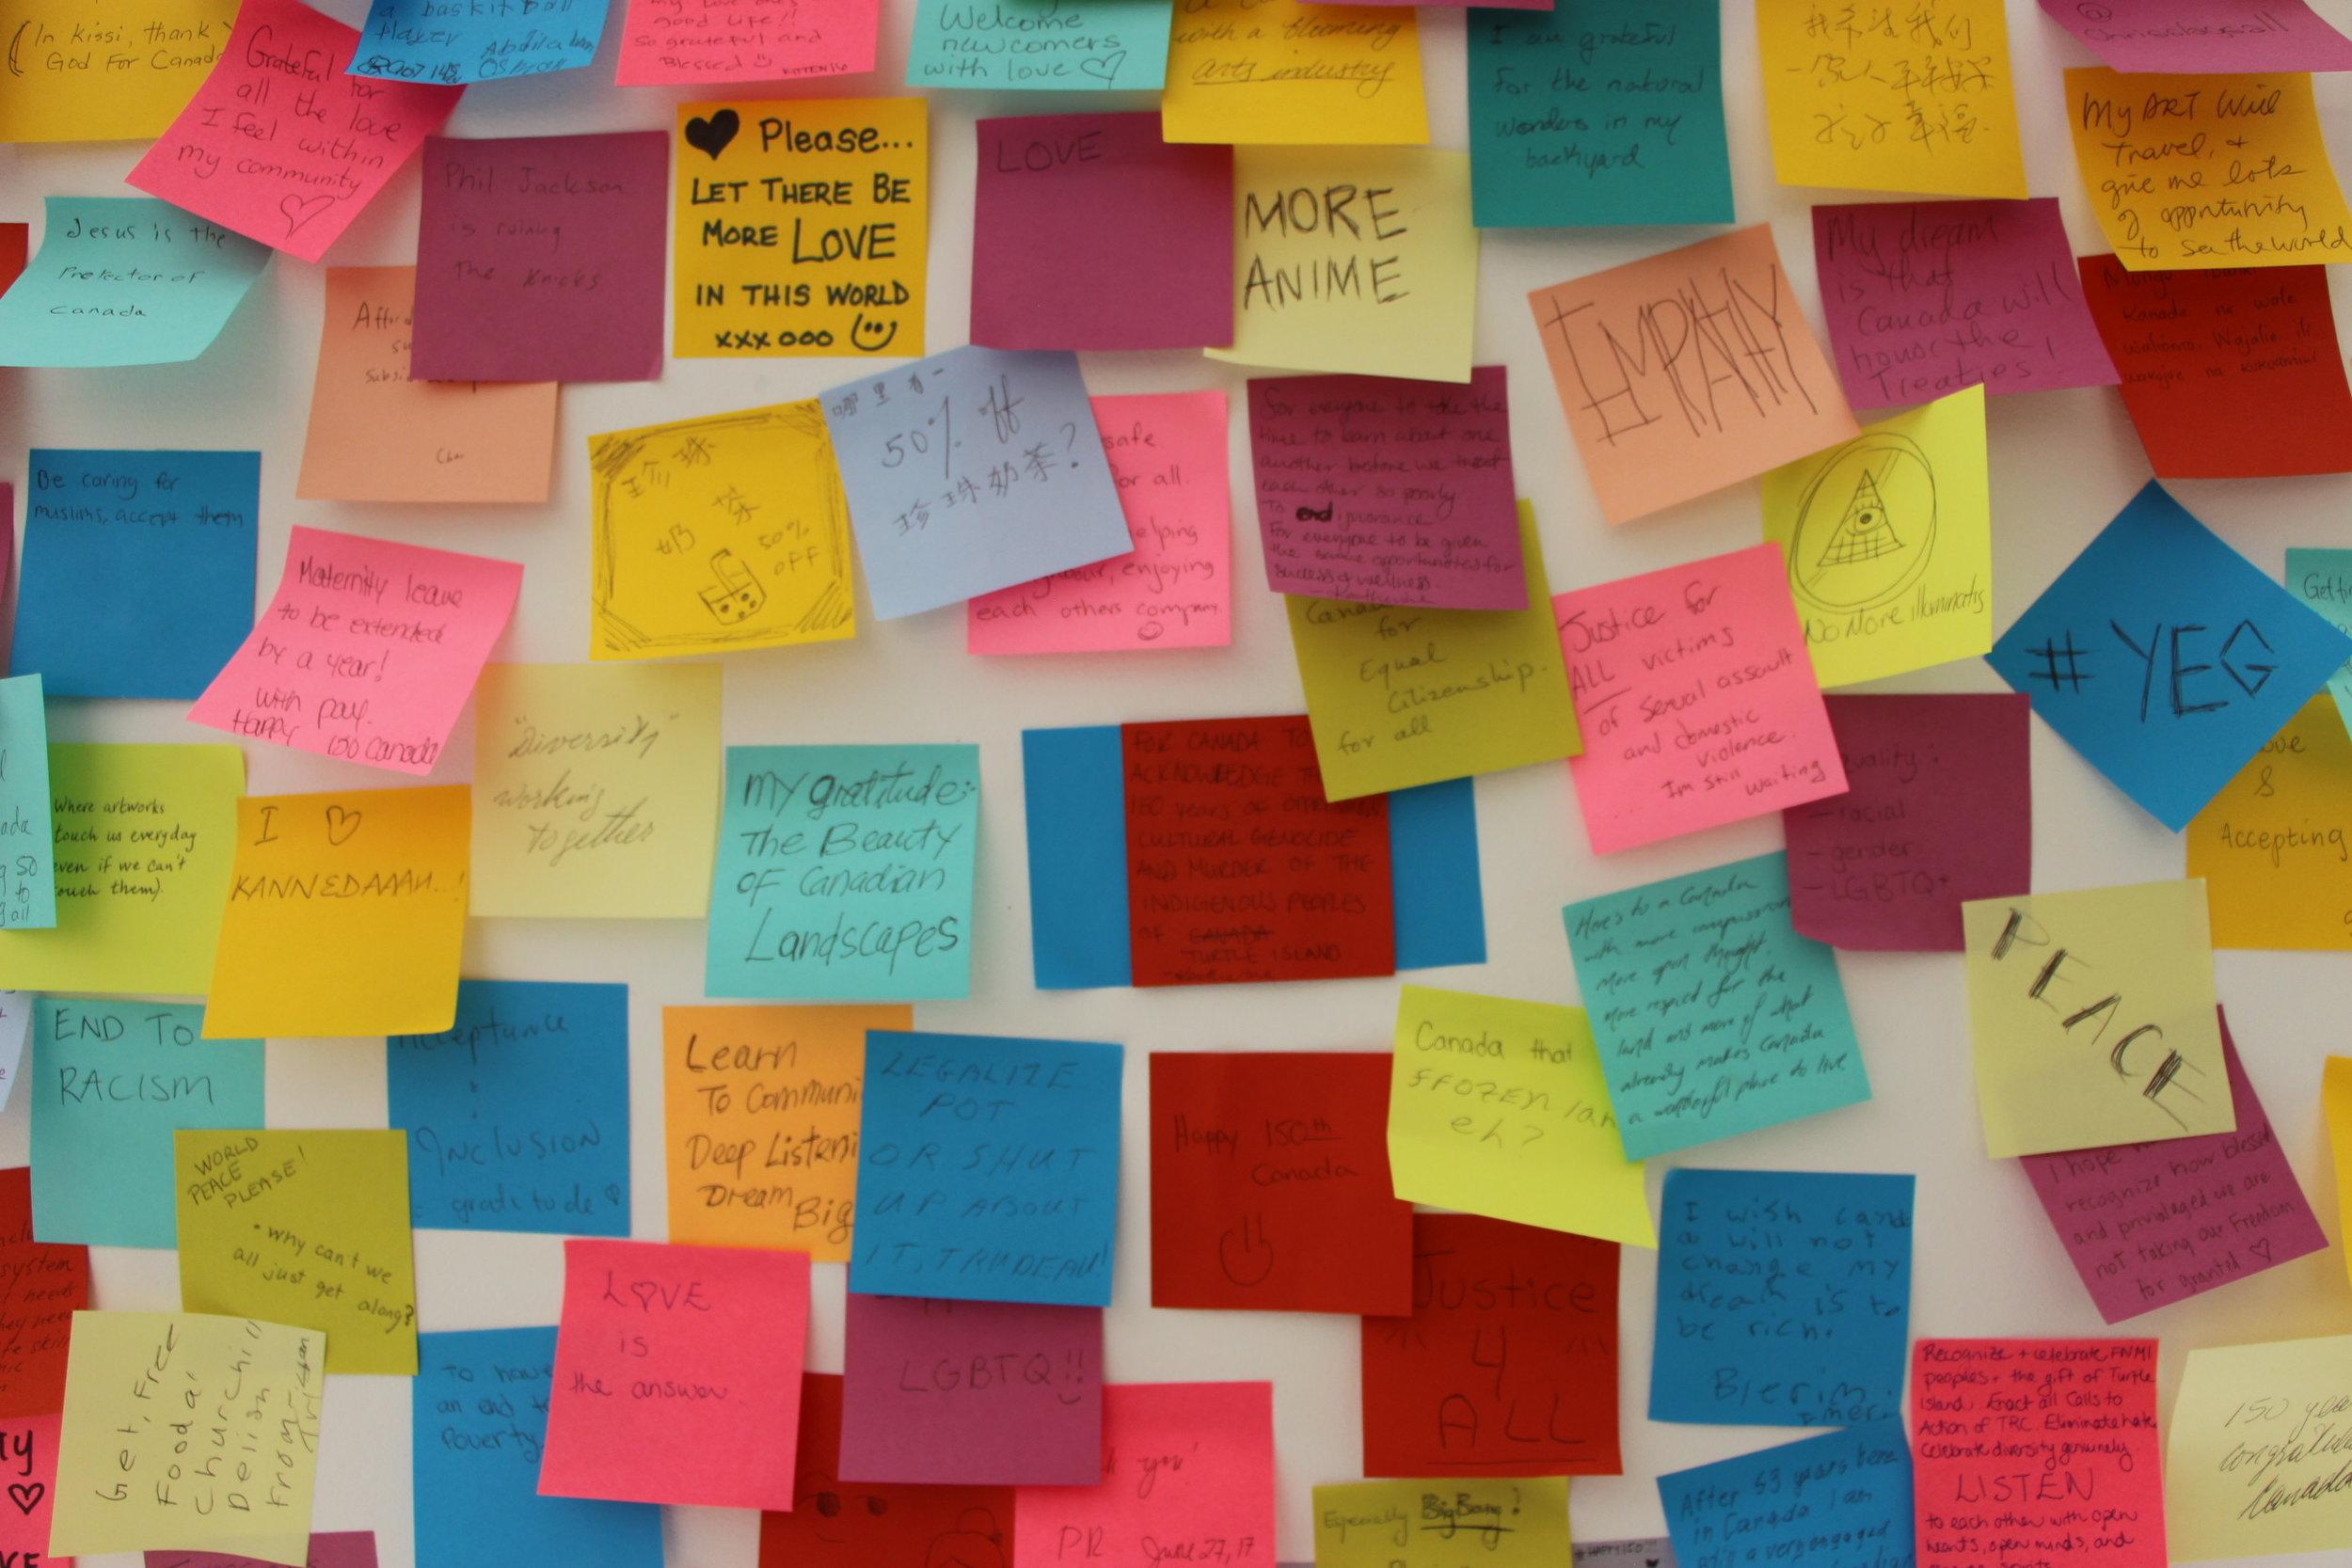 """A Possible Canada"" asks visitors to post gratitudes, dreams, visions for a possible Canada."